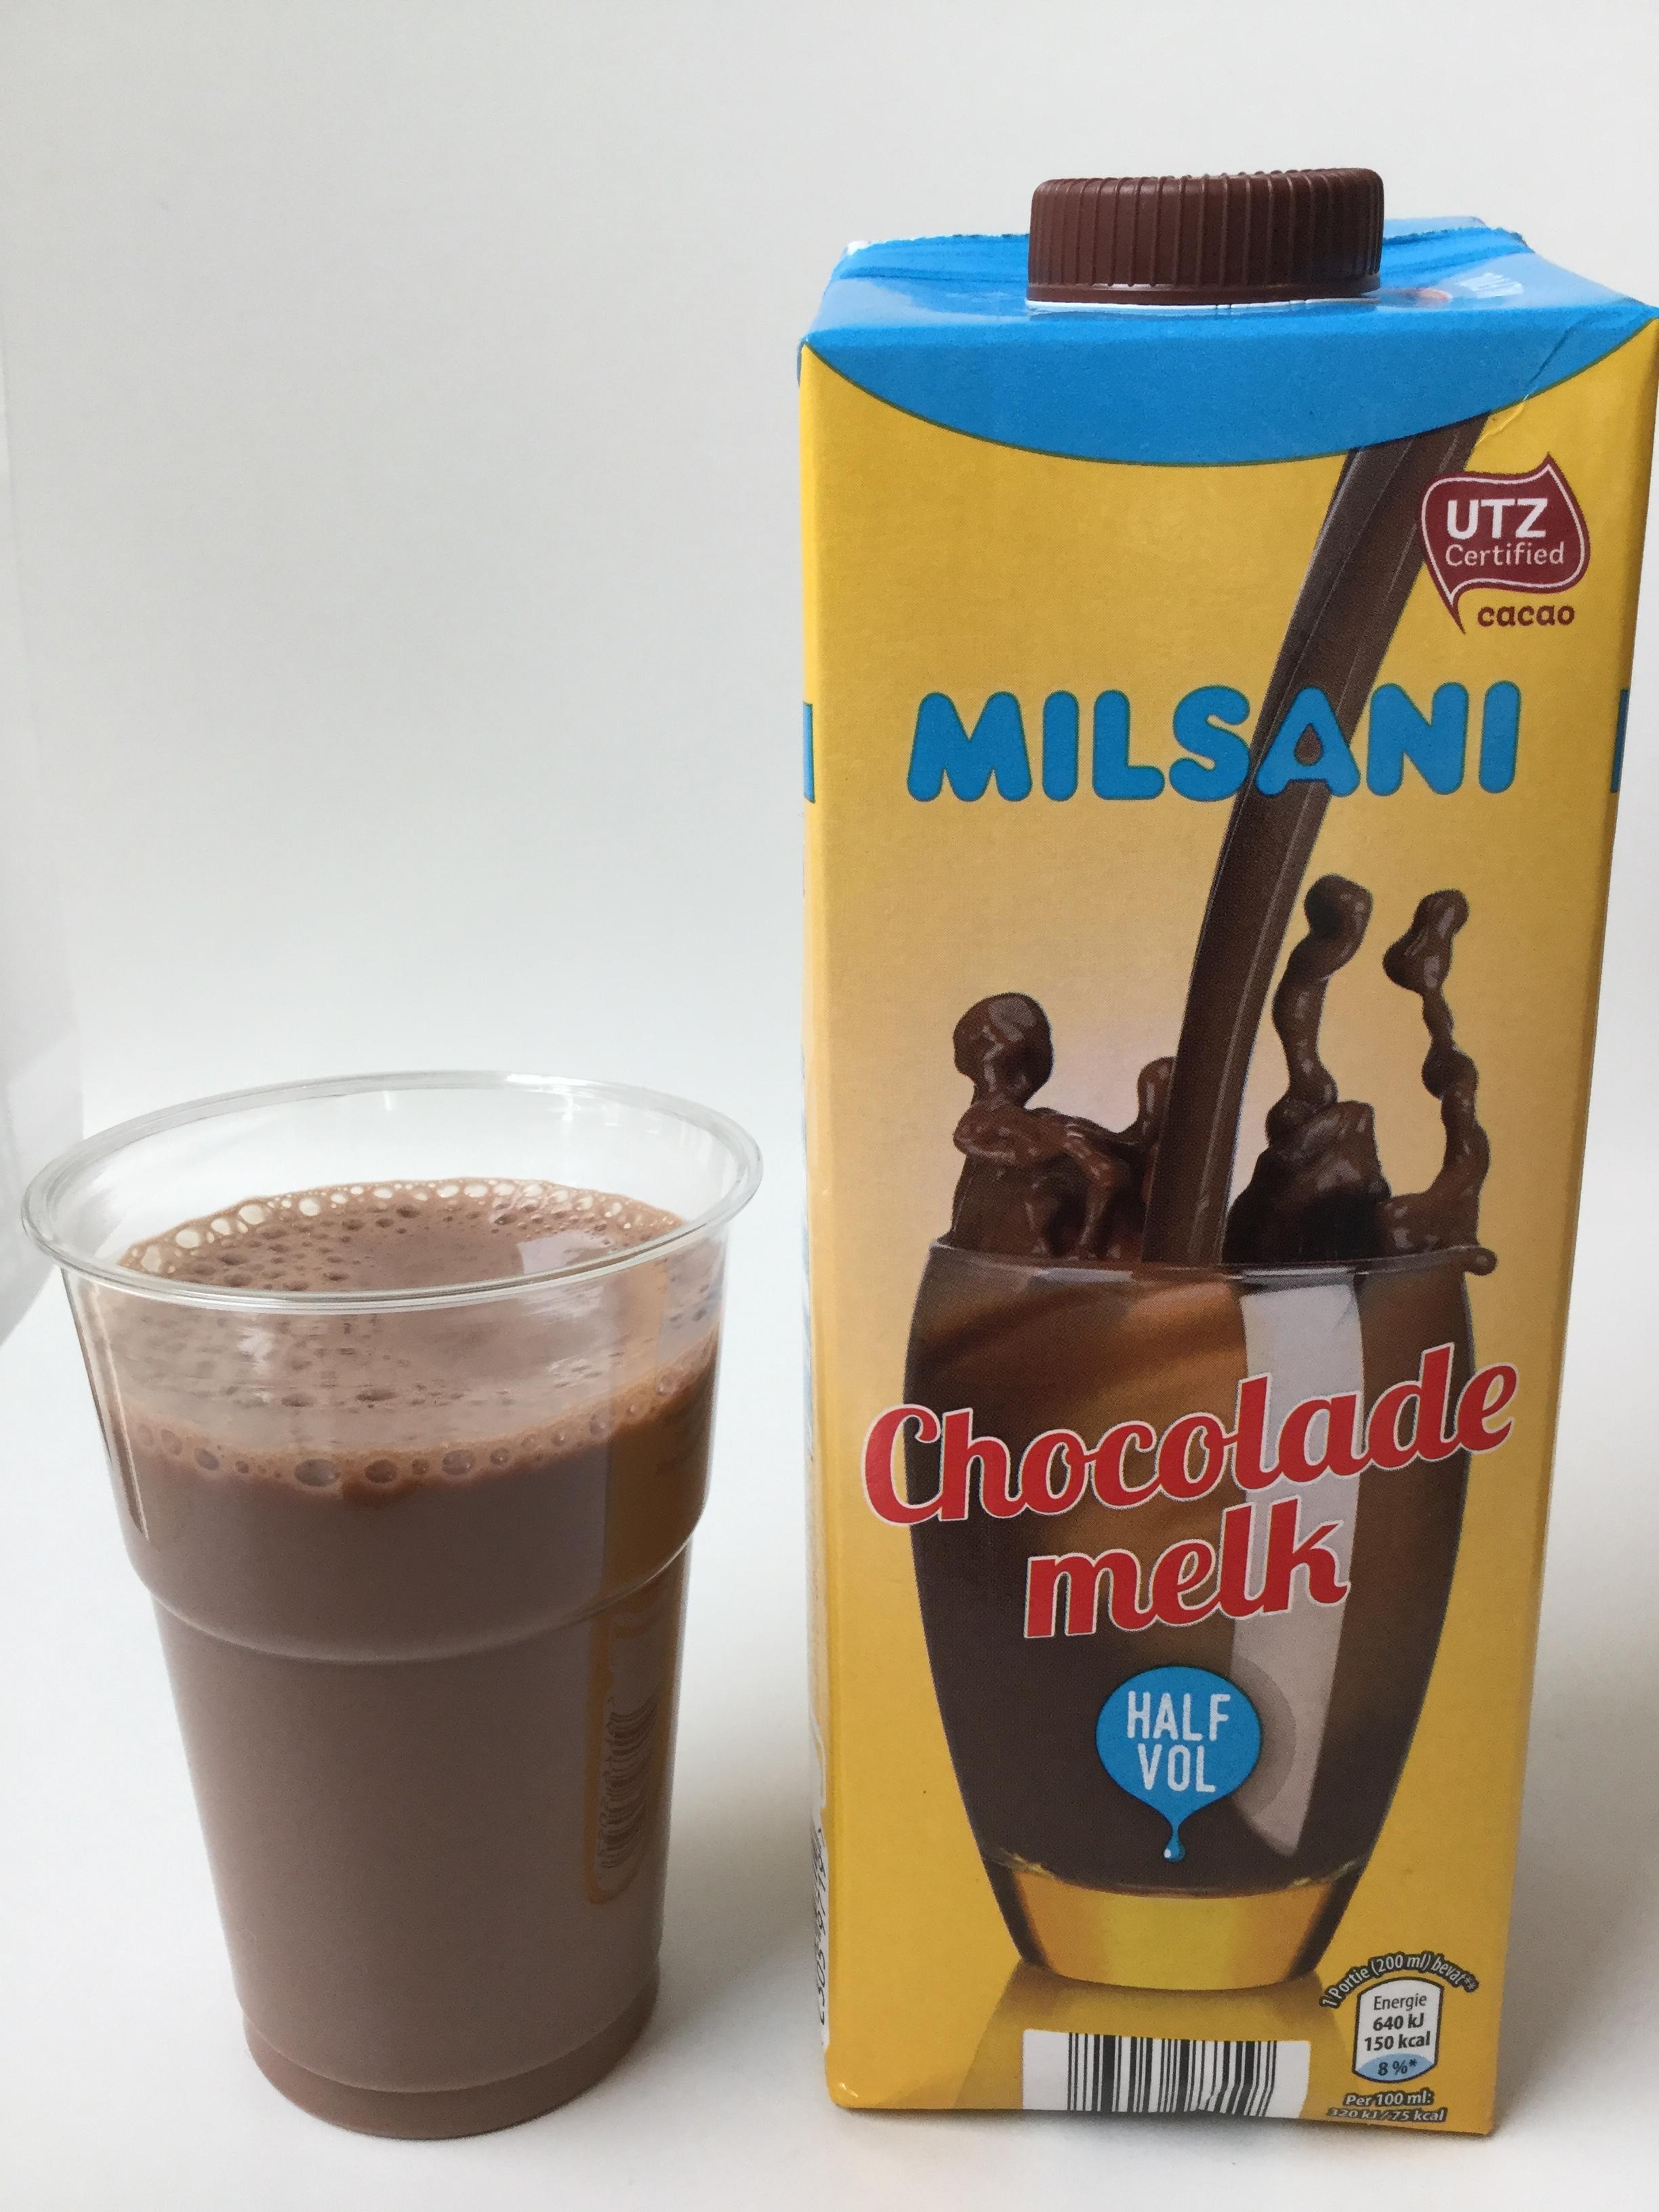 Milsani Chocolade Melk Half Vol Cup